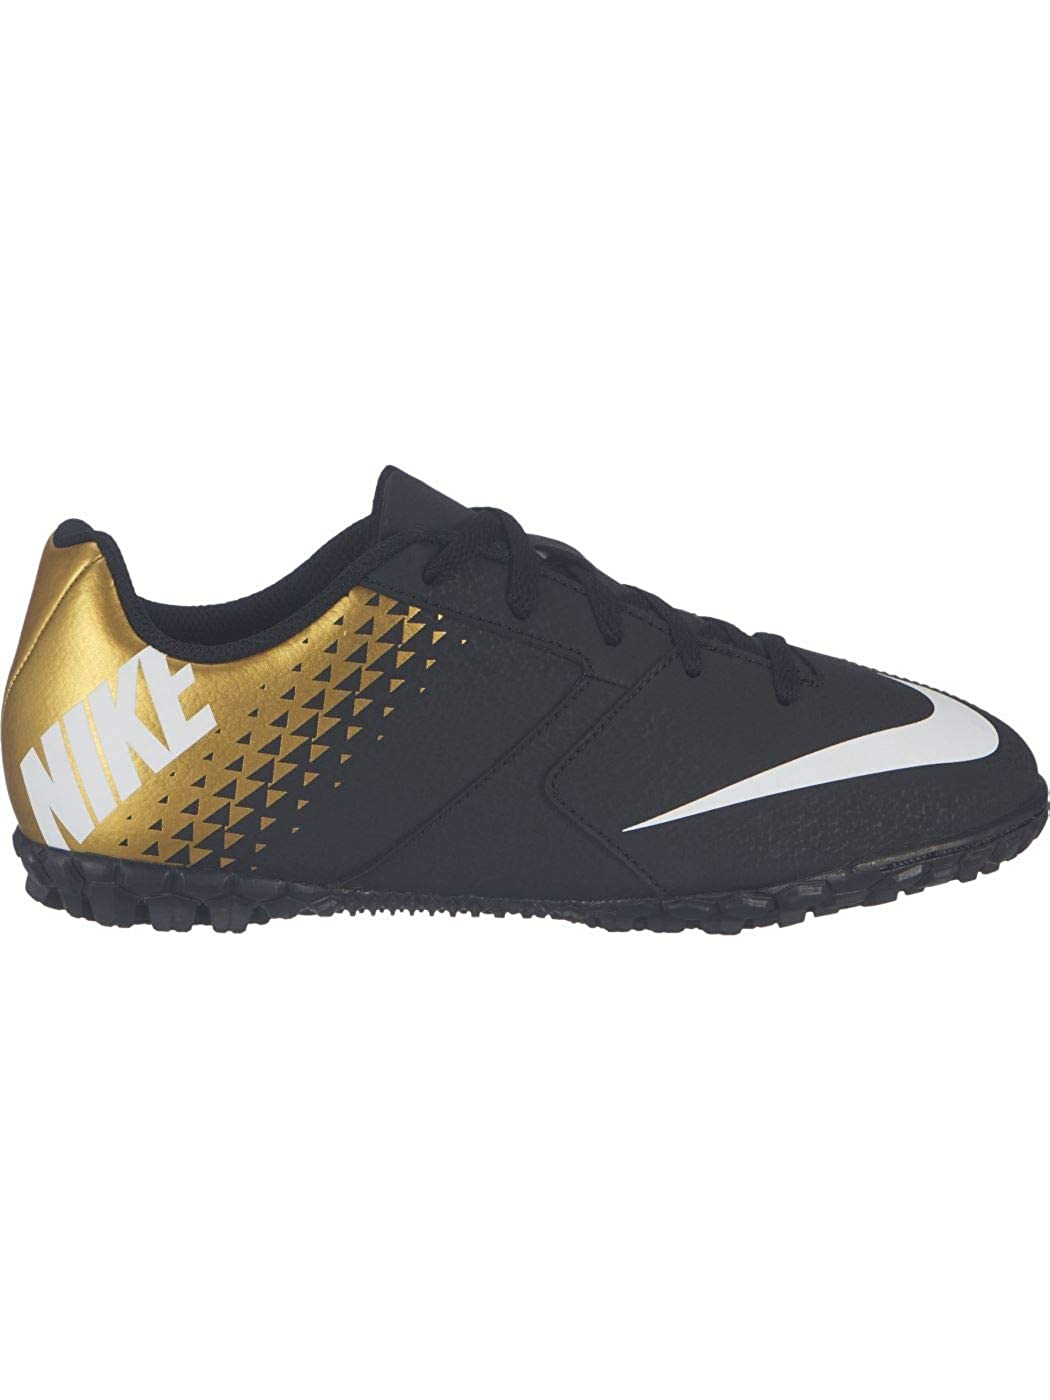 Nike Junior Bomba TF Turf Soccer Shoes Black//White//Gold